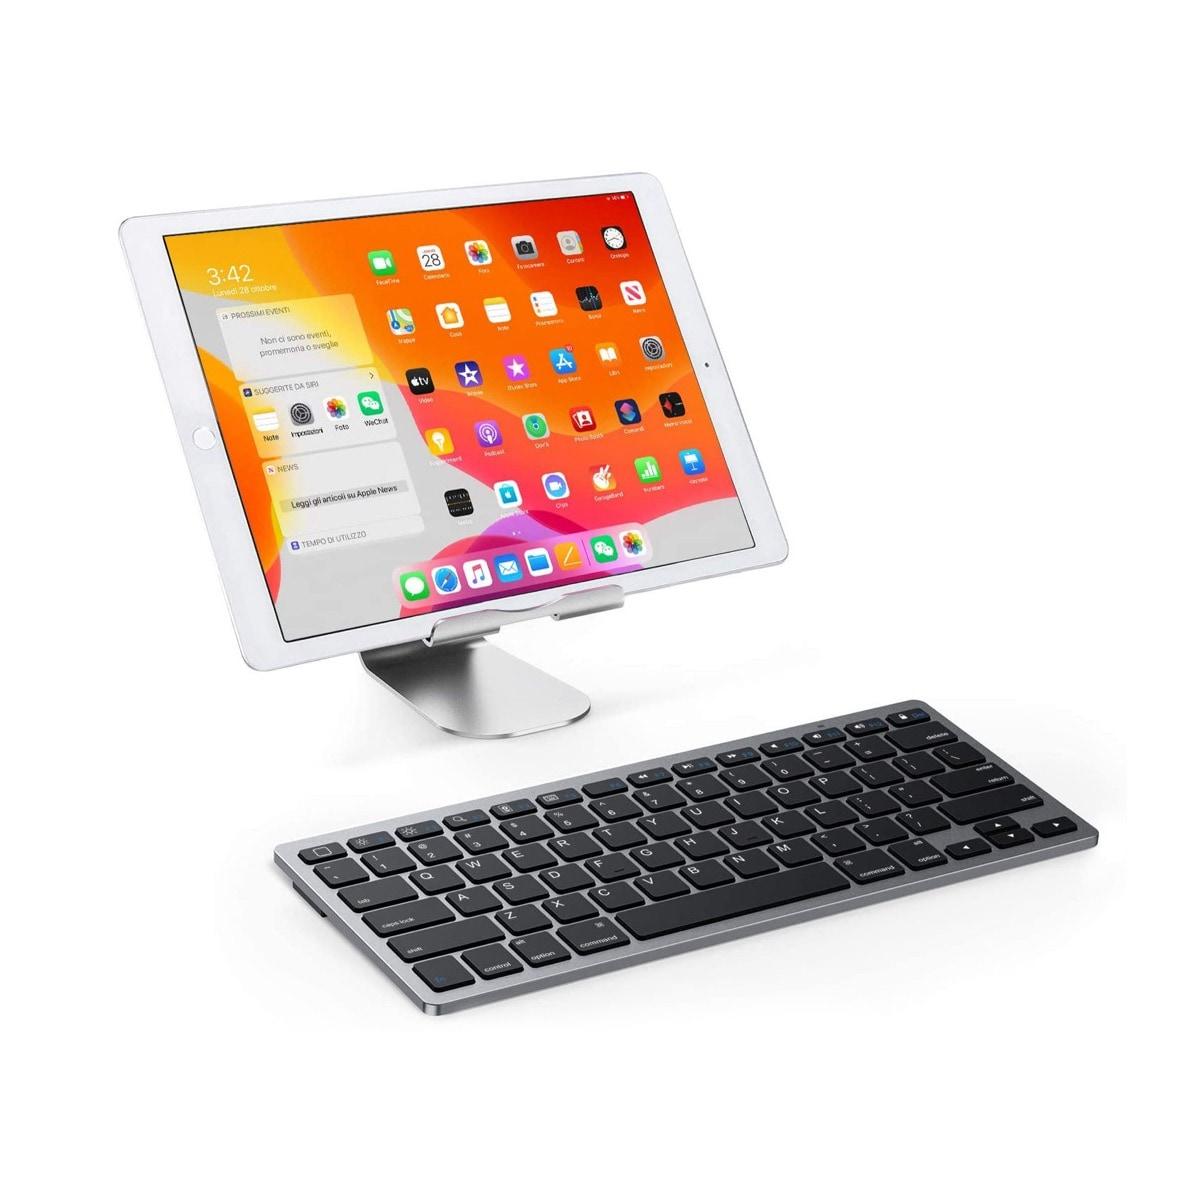 Omoton universal keyboard long battery Amazon Fire